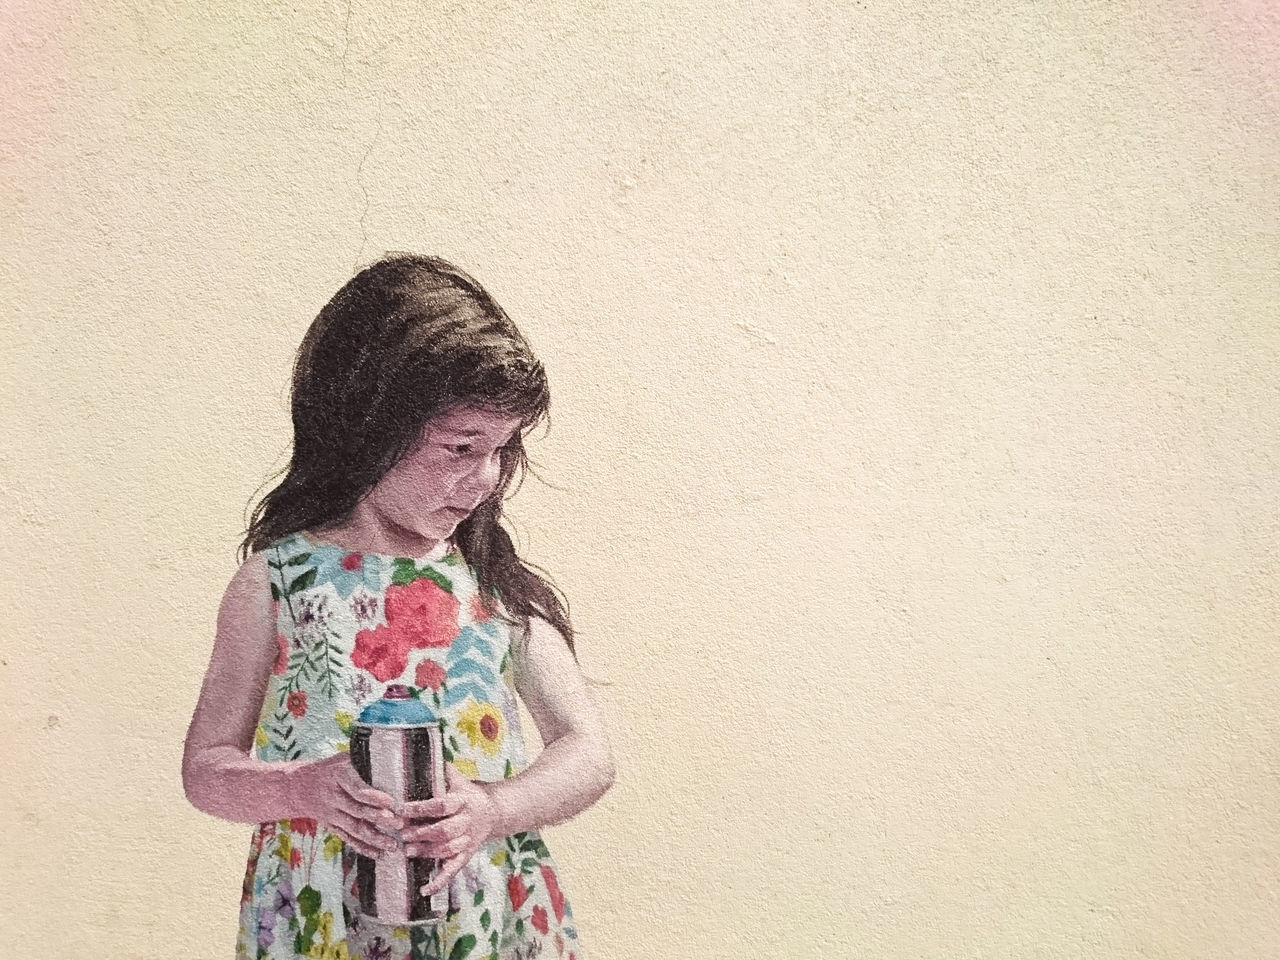 Mural Art Urban Photography Spray Paint Outdoors Day Eyeem Philippines Album Portrait